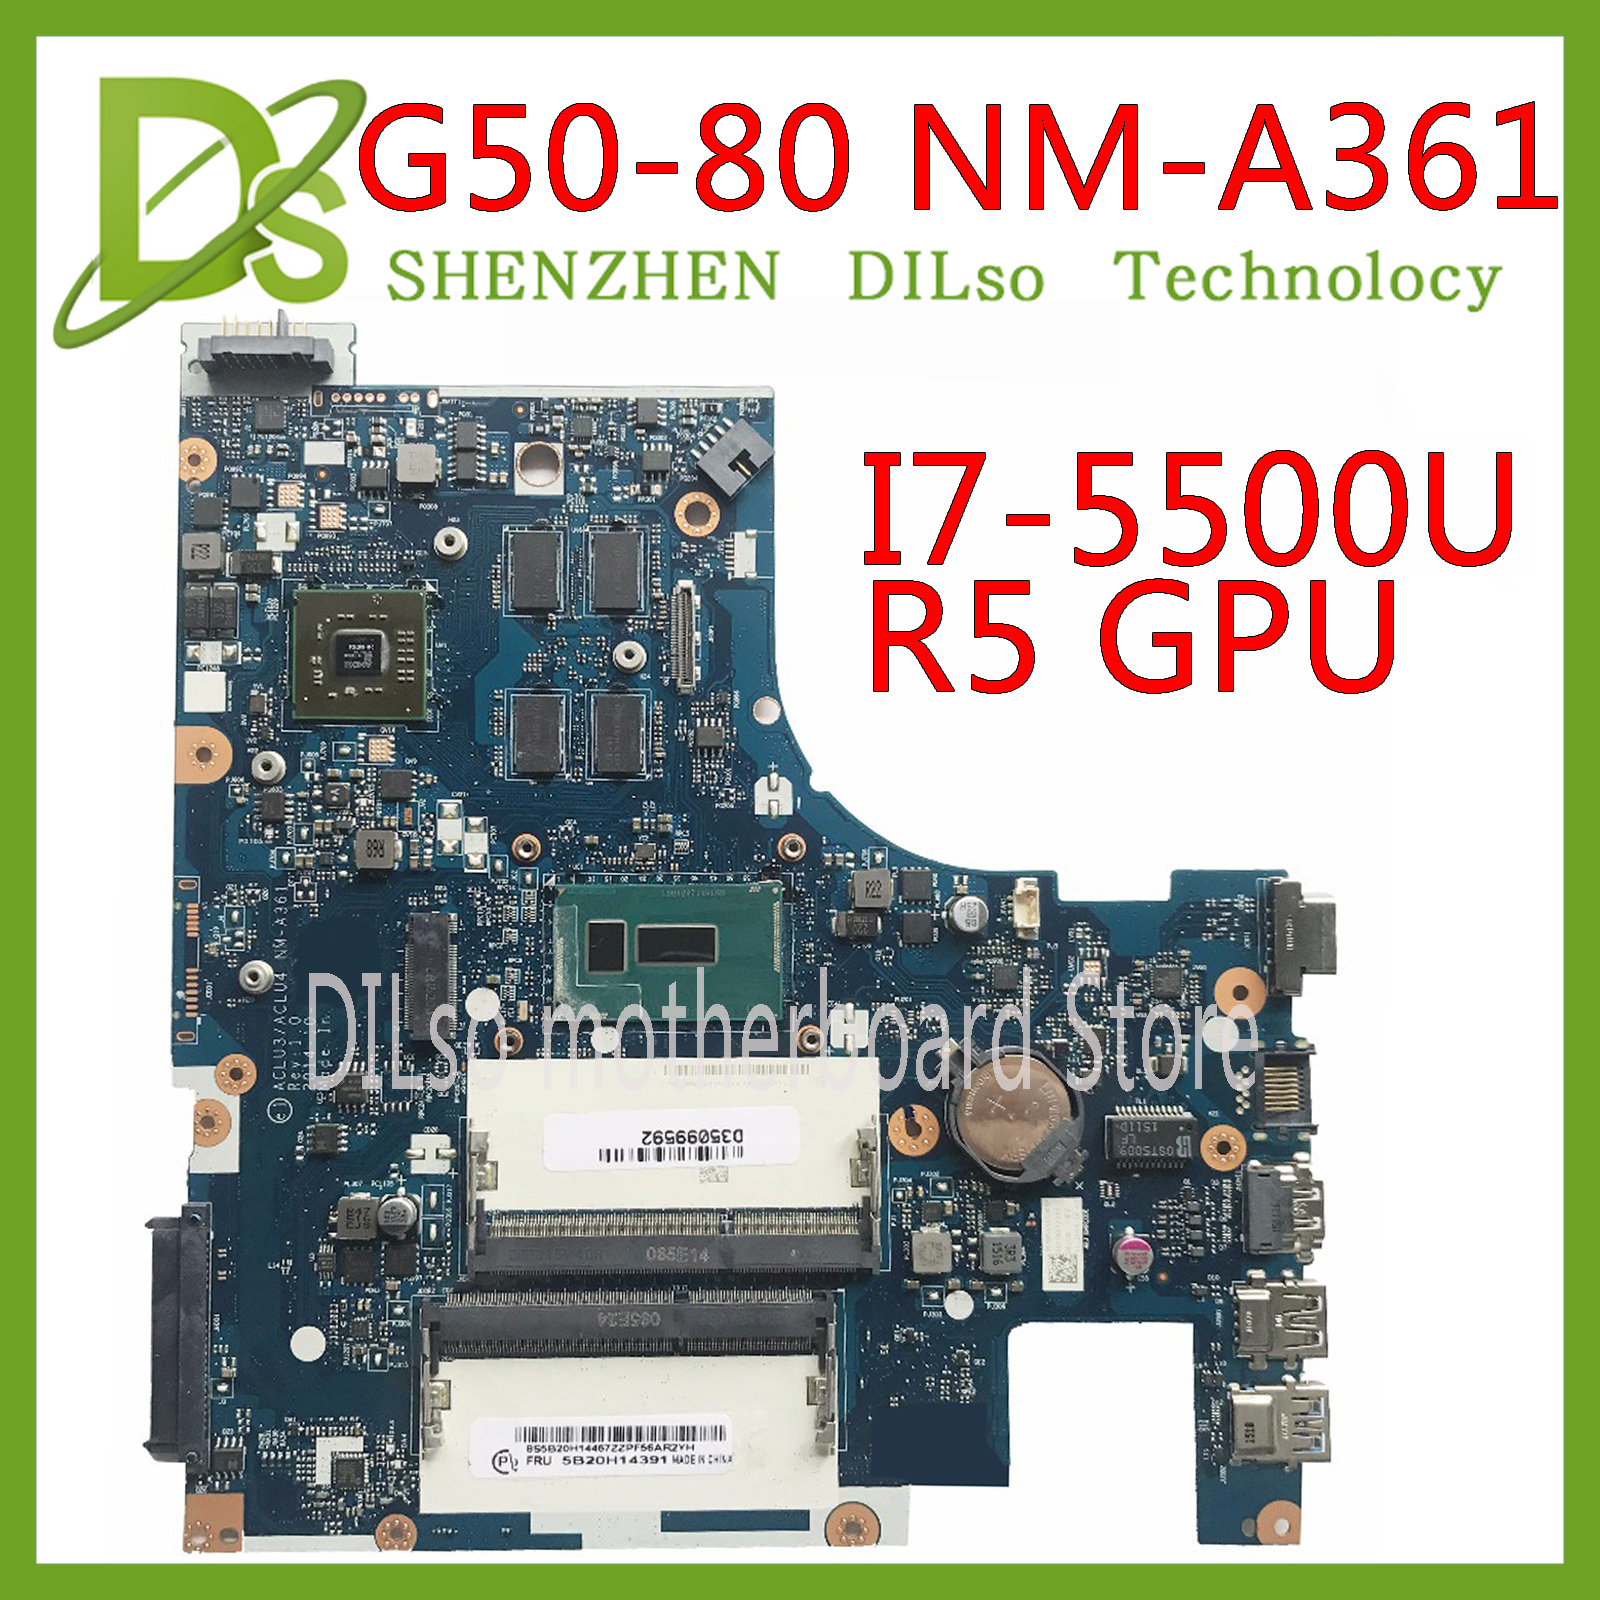 KEFU NM-A361 Motherboard For Lenovo G50-80 ACLU3/ACLU4 NM-A361 PM Laptop Motherboard Notebook I7-5500 CPU Original Test